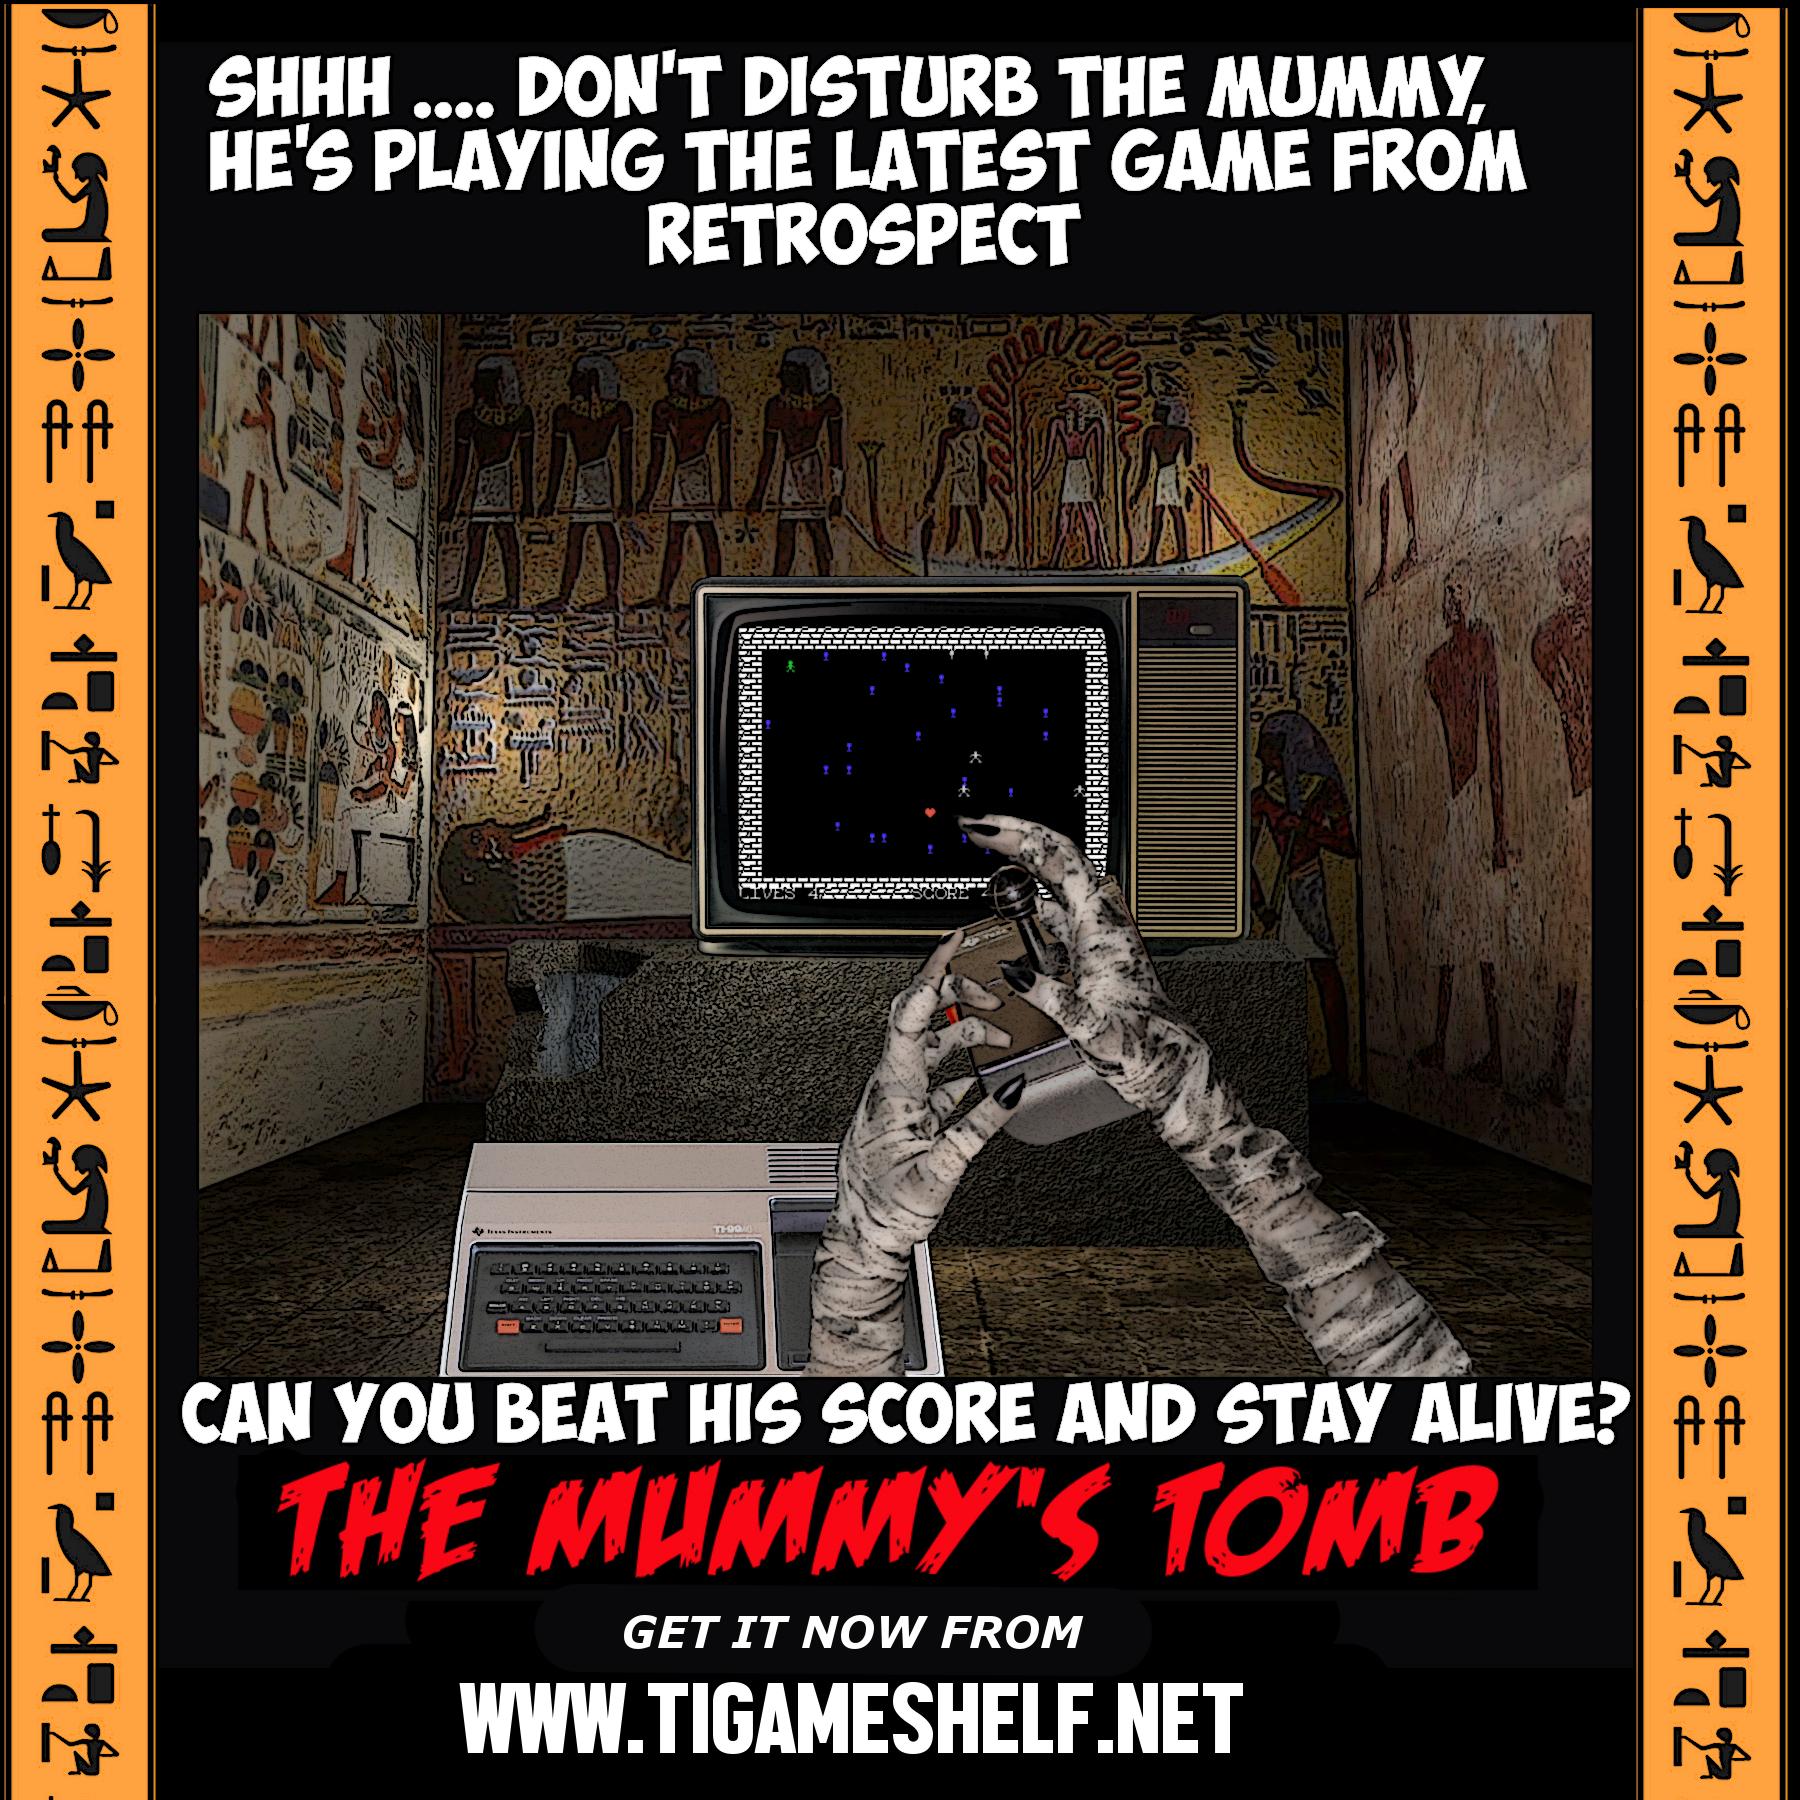 The Mummy's Tomb advertisement